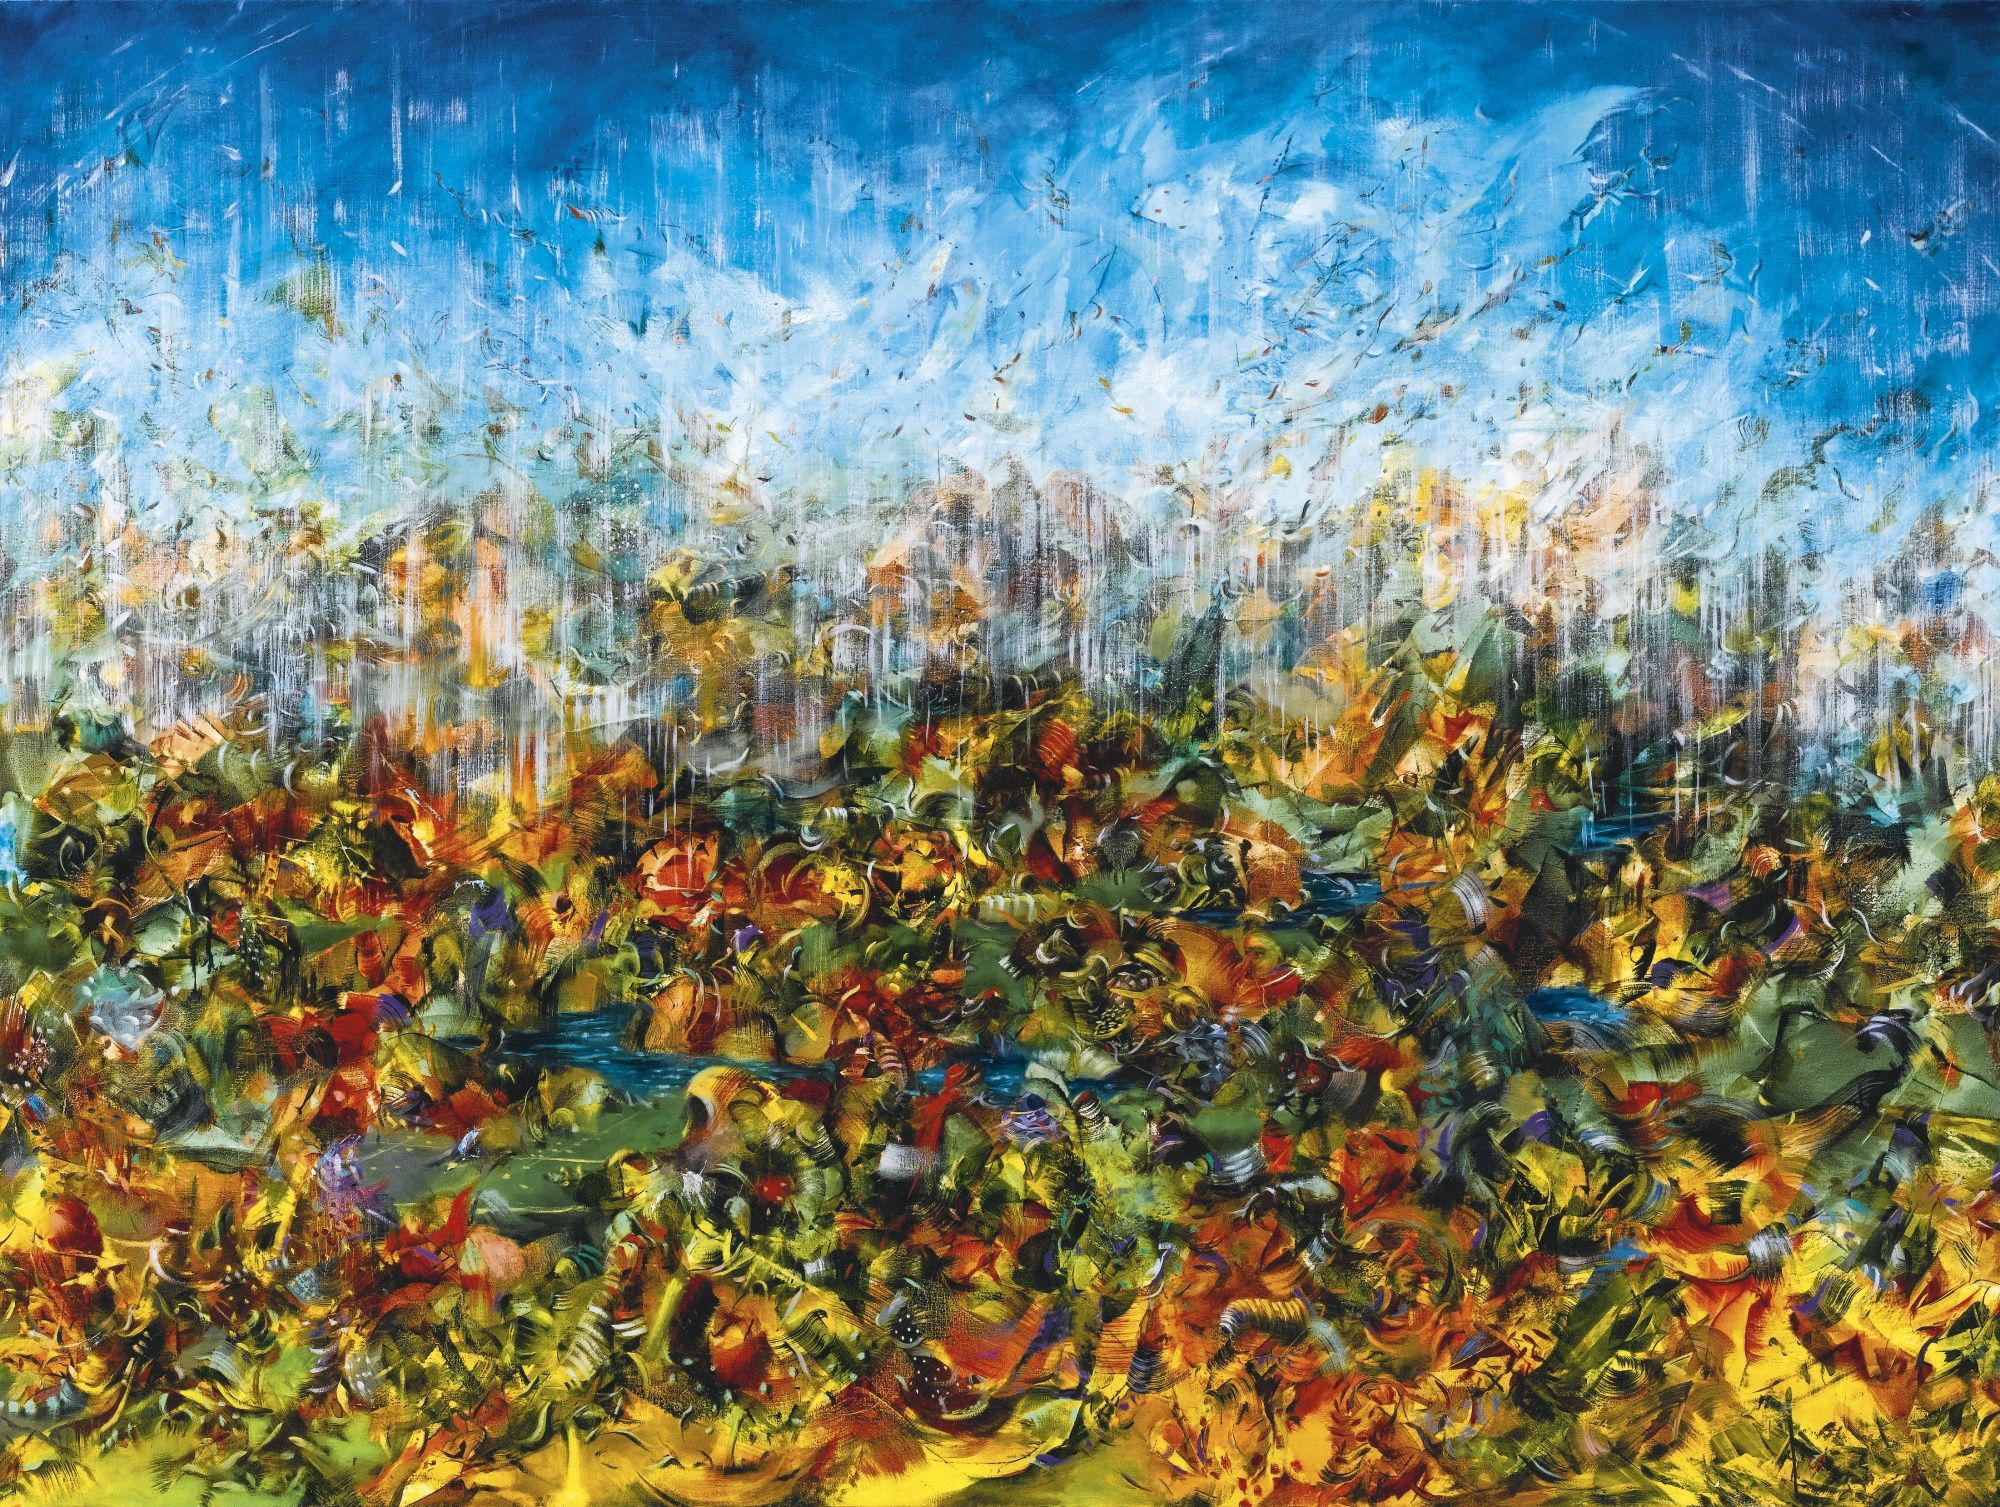 Contemporary Art- Doha 13 Oct 2014 Ali Banisadr- The Chase Estimate 180,000   250,000